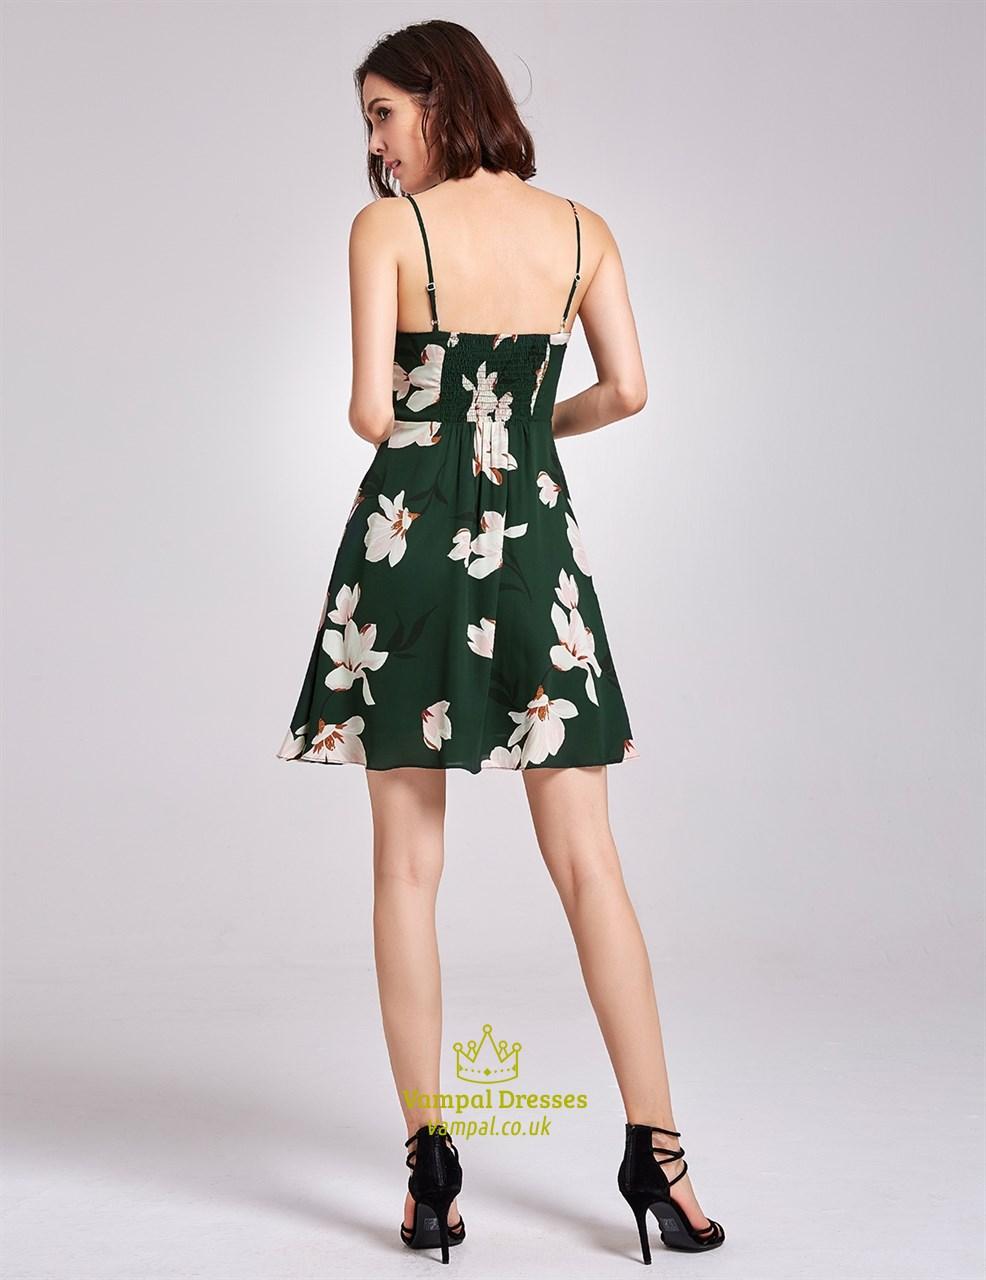 7aa9c341c2d3 Lovely Dark Green Spaghetti Strap Knee Length A-Line Floral Dress ...